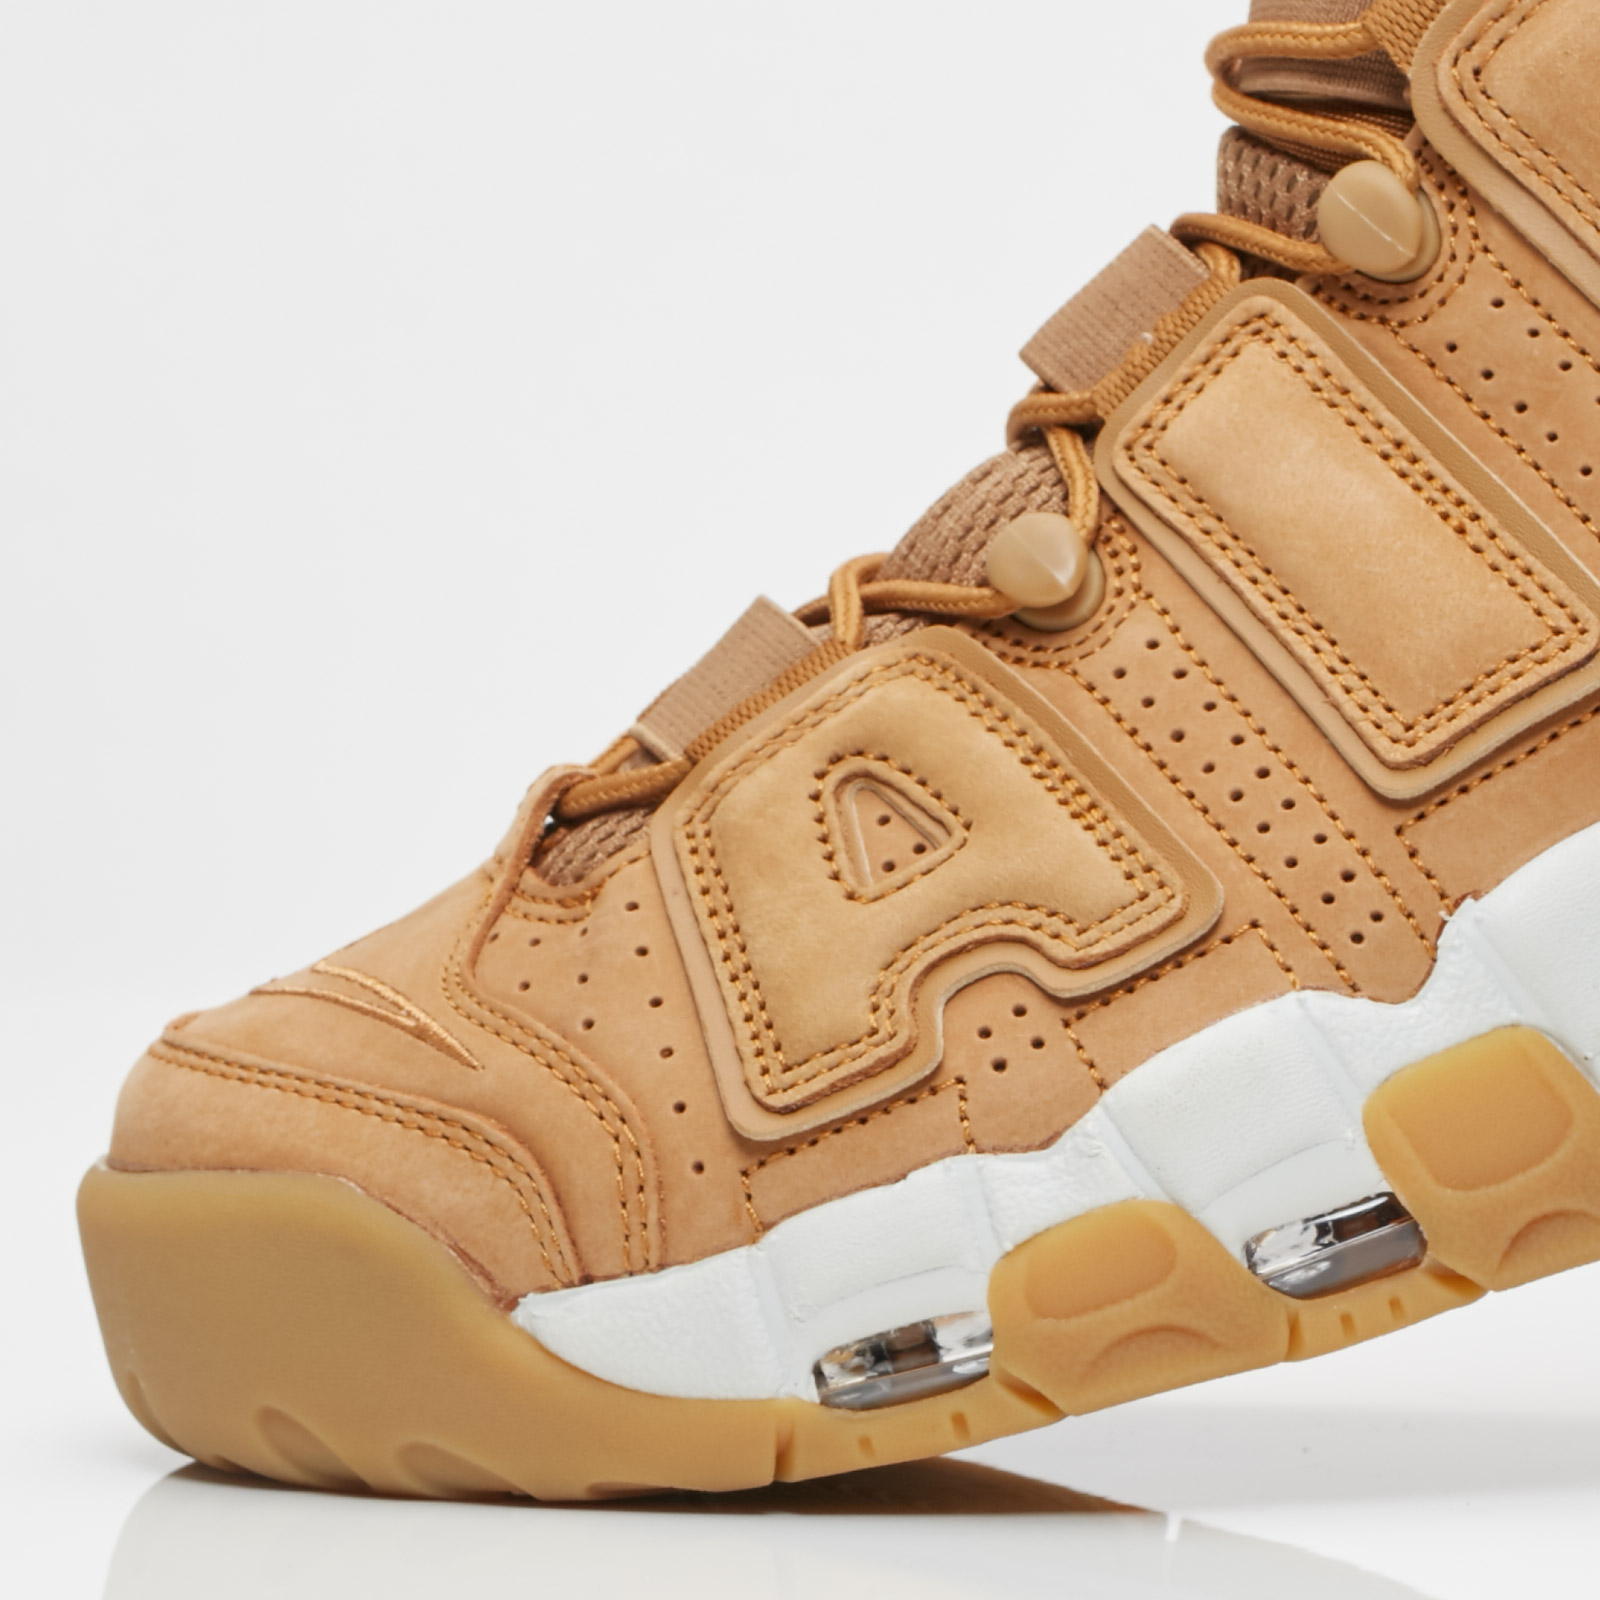 440b9614c5 Nike Air More Uptempo 96 Premium - Aa4060-200 - Sneakersnstuff ...